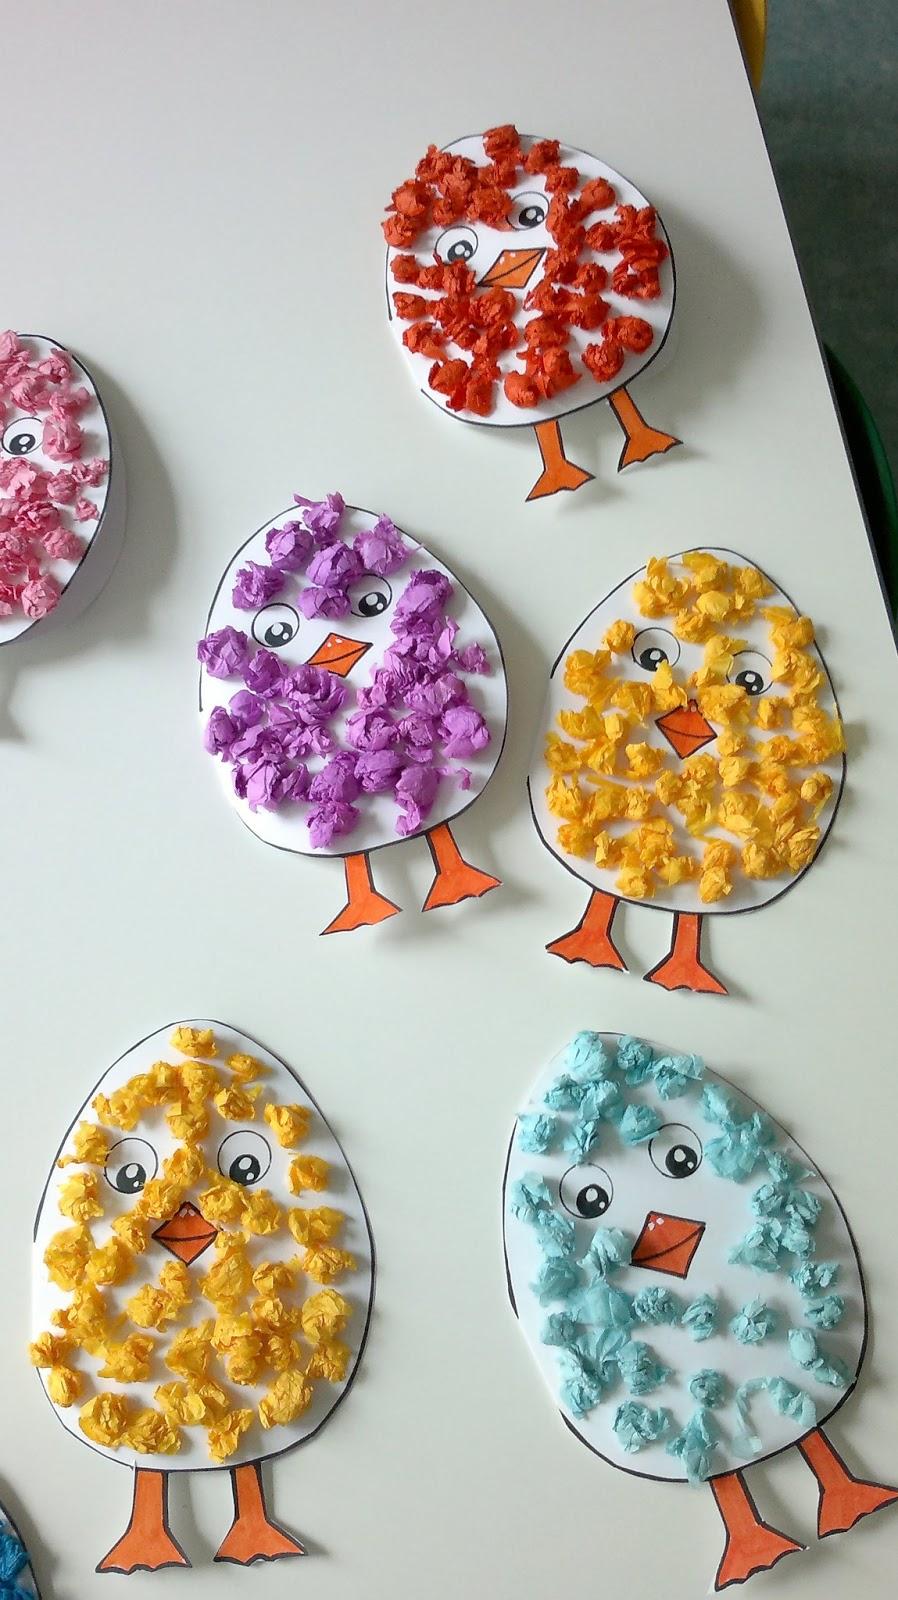 Asilo nido il girasole marzo 2013 - Pinterest bastelideen ...